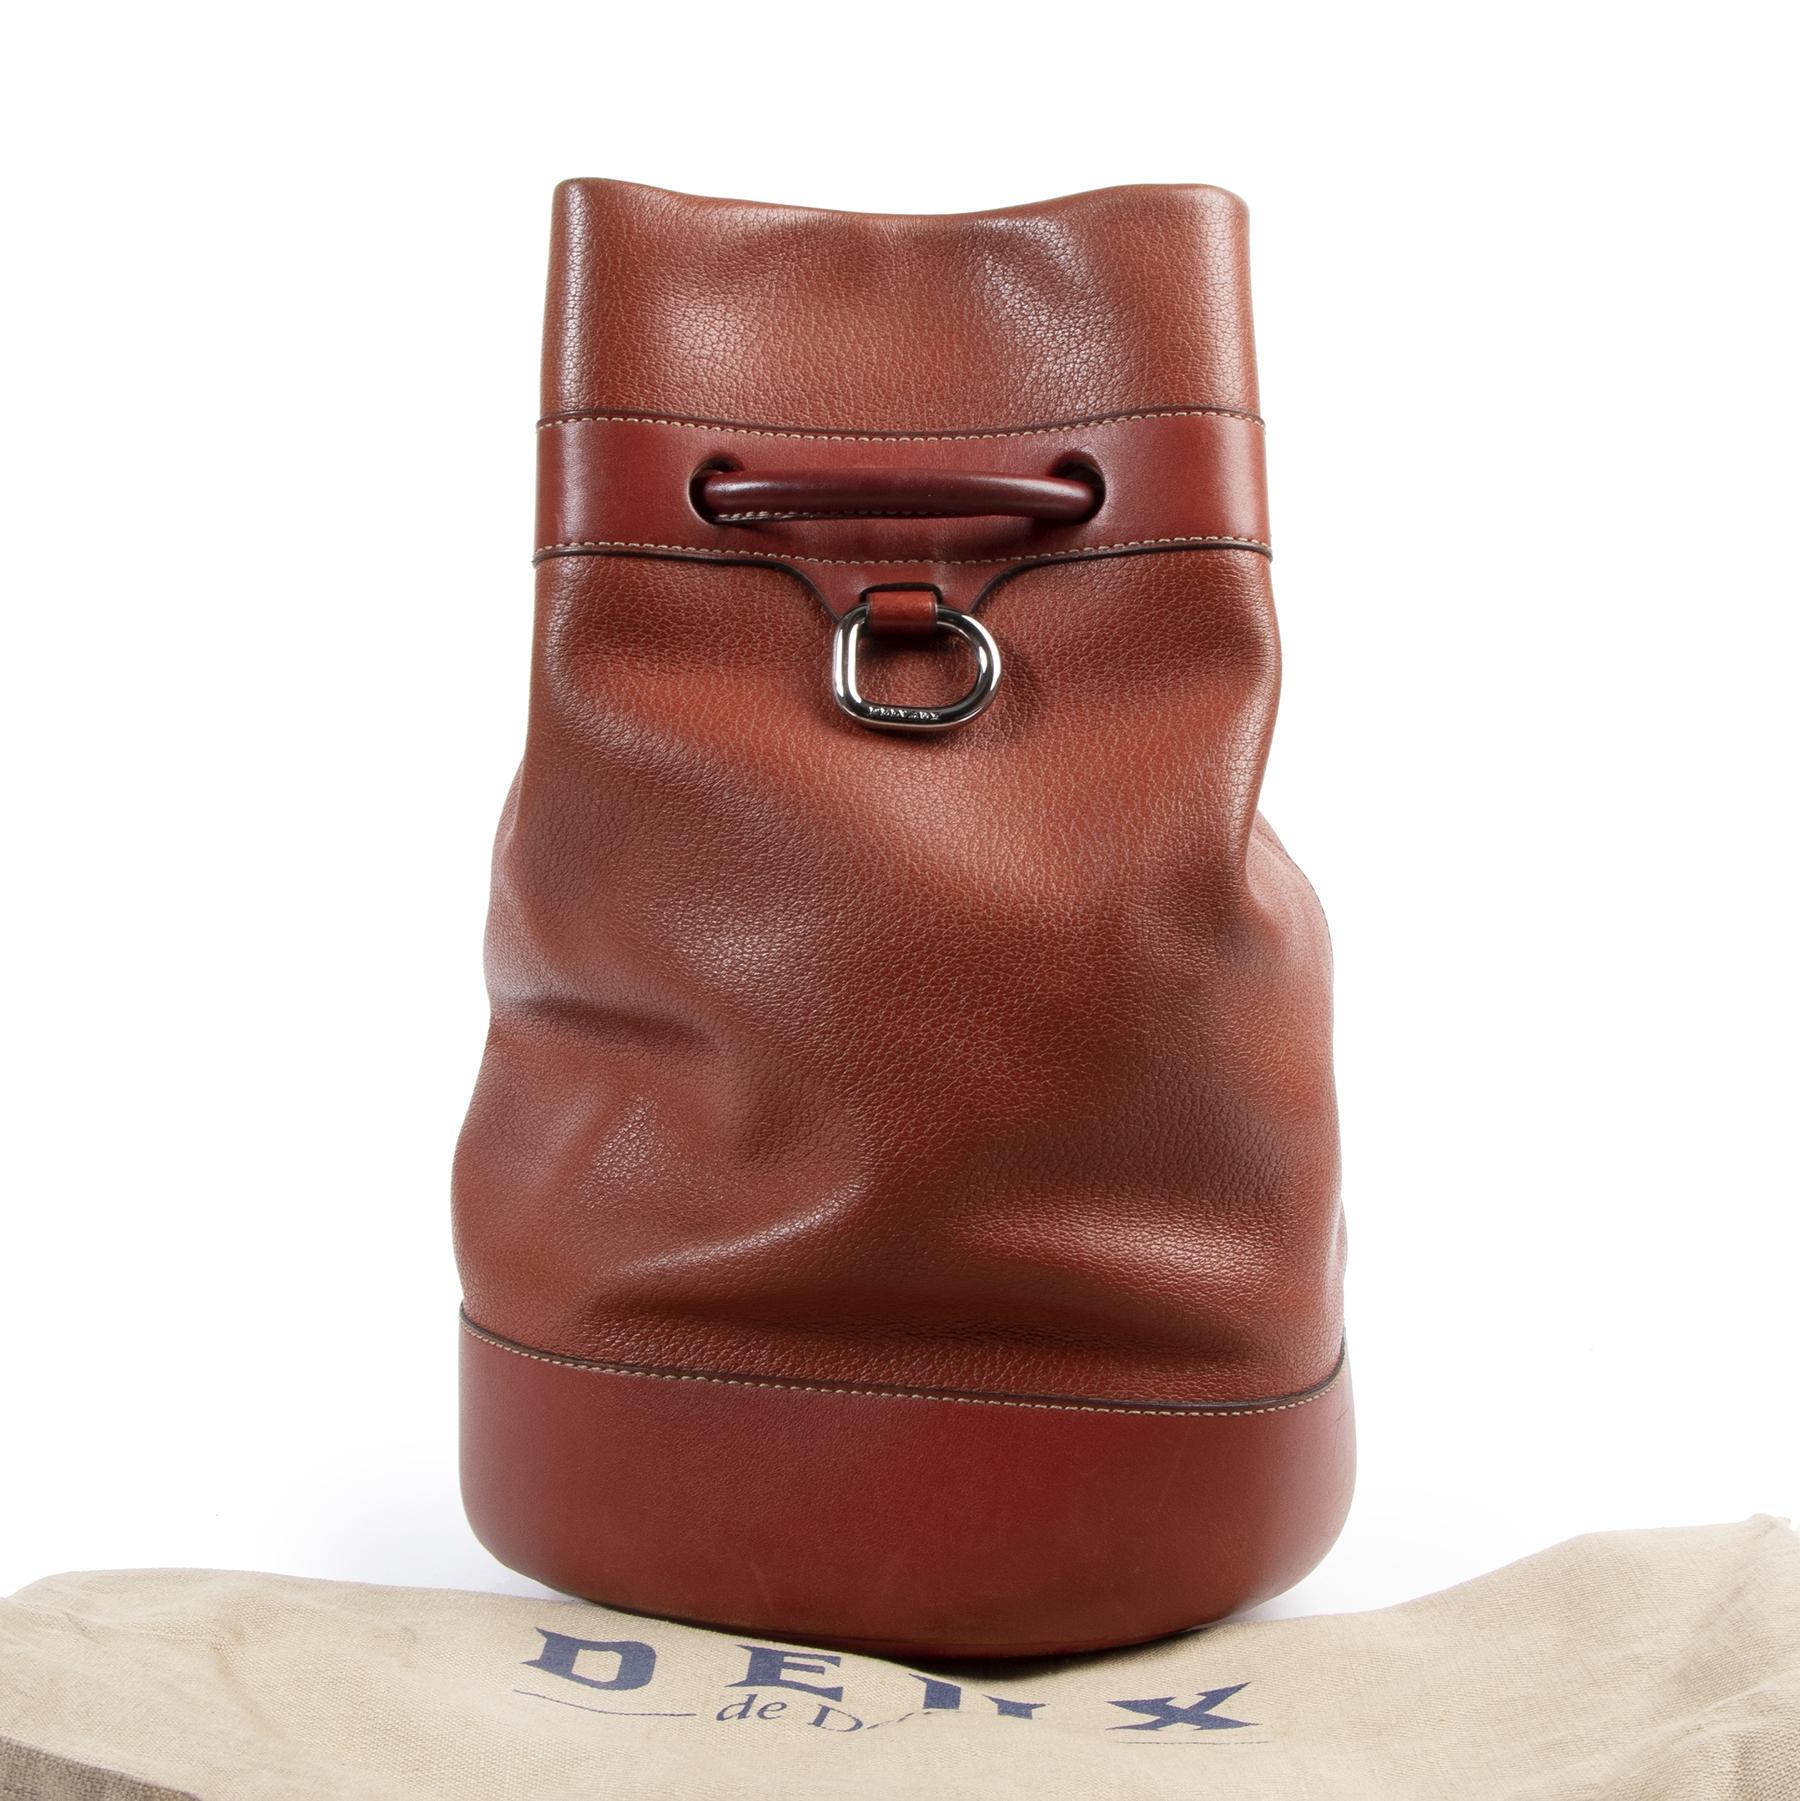 Delvaux Deux de Delvaux Rust Bucket Bag